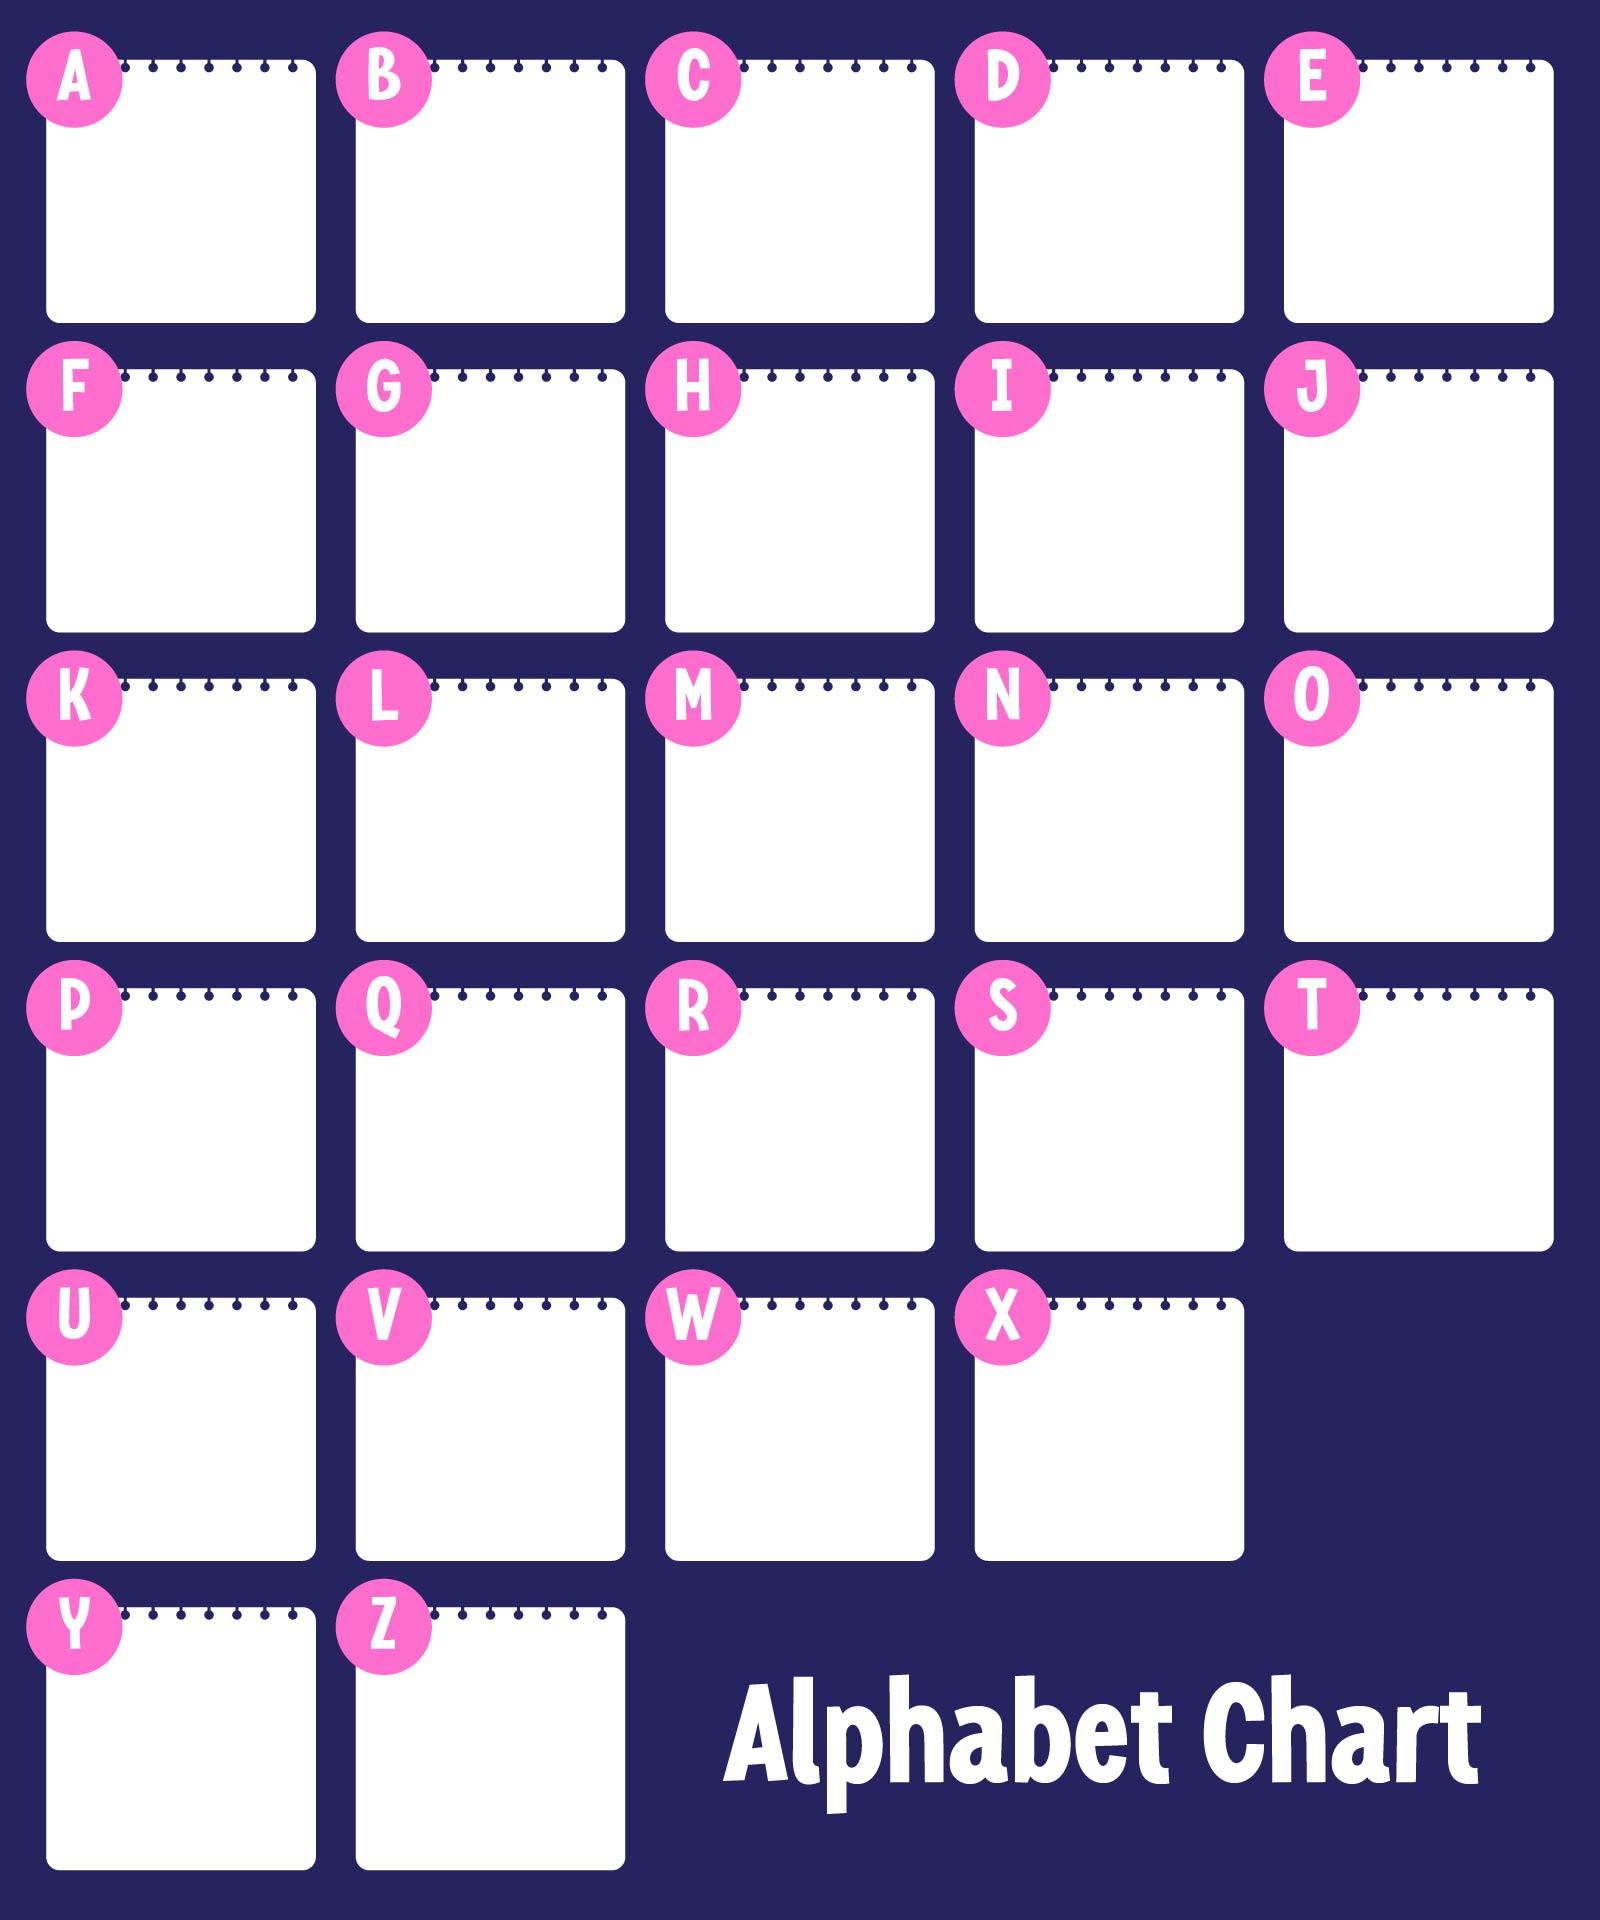 Free Printable Kindergarten Alphabet Chart